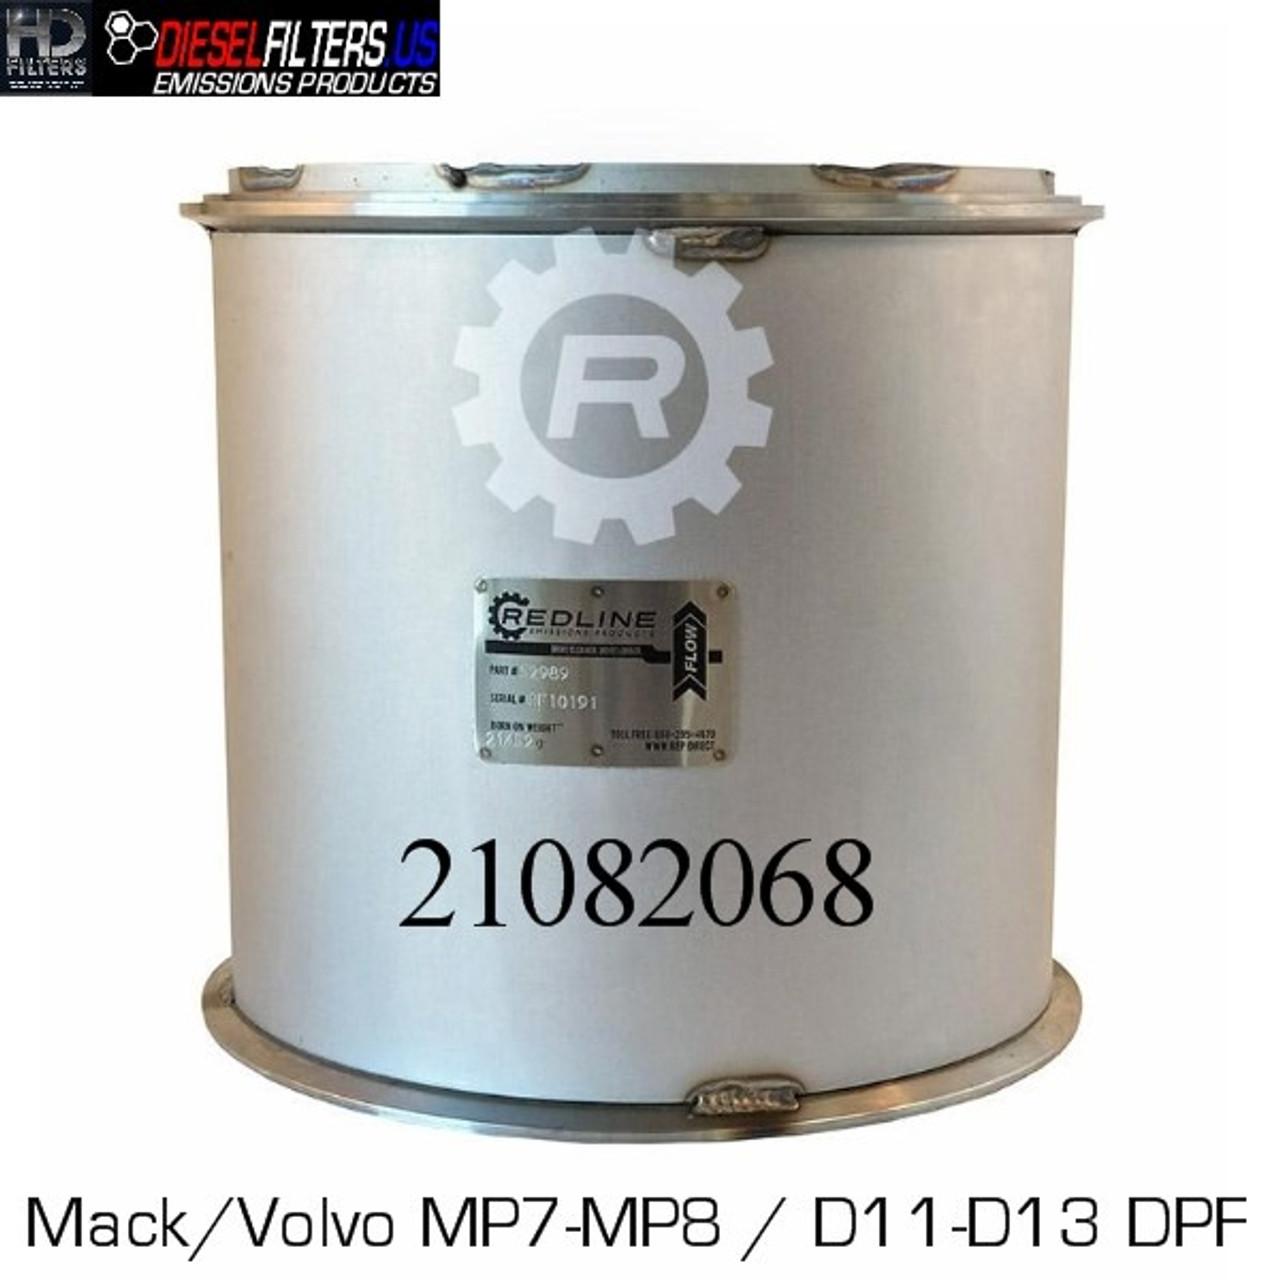 21082068 Mack/Volvo MP7/MP8-D11/D13 DPF (RED 52989)